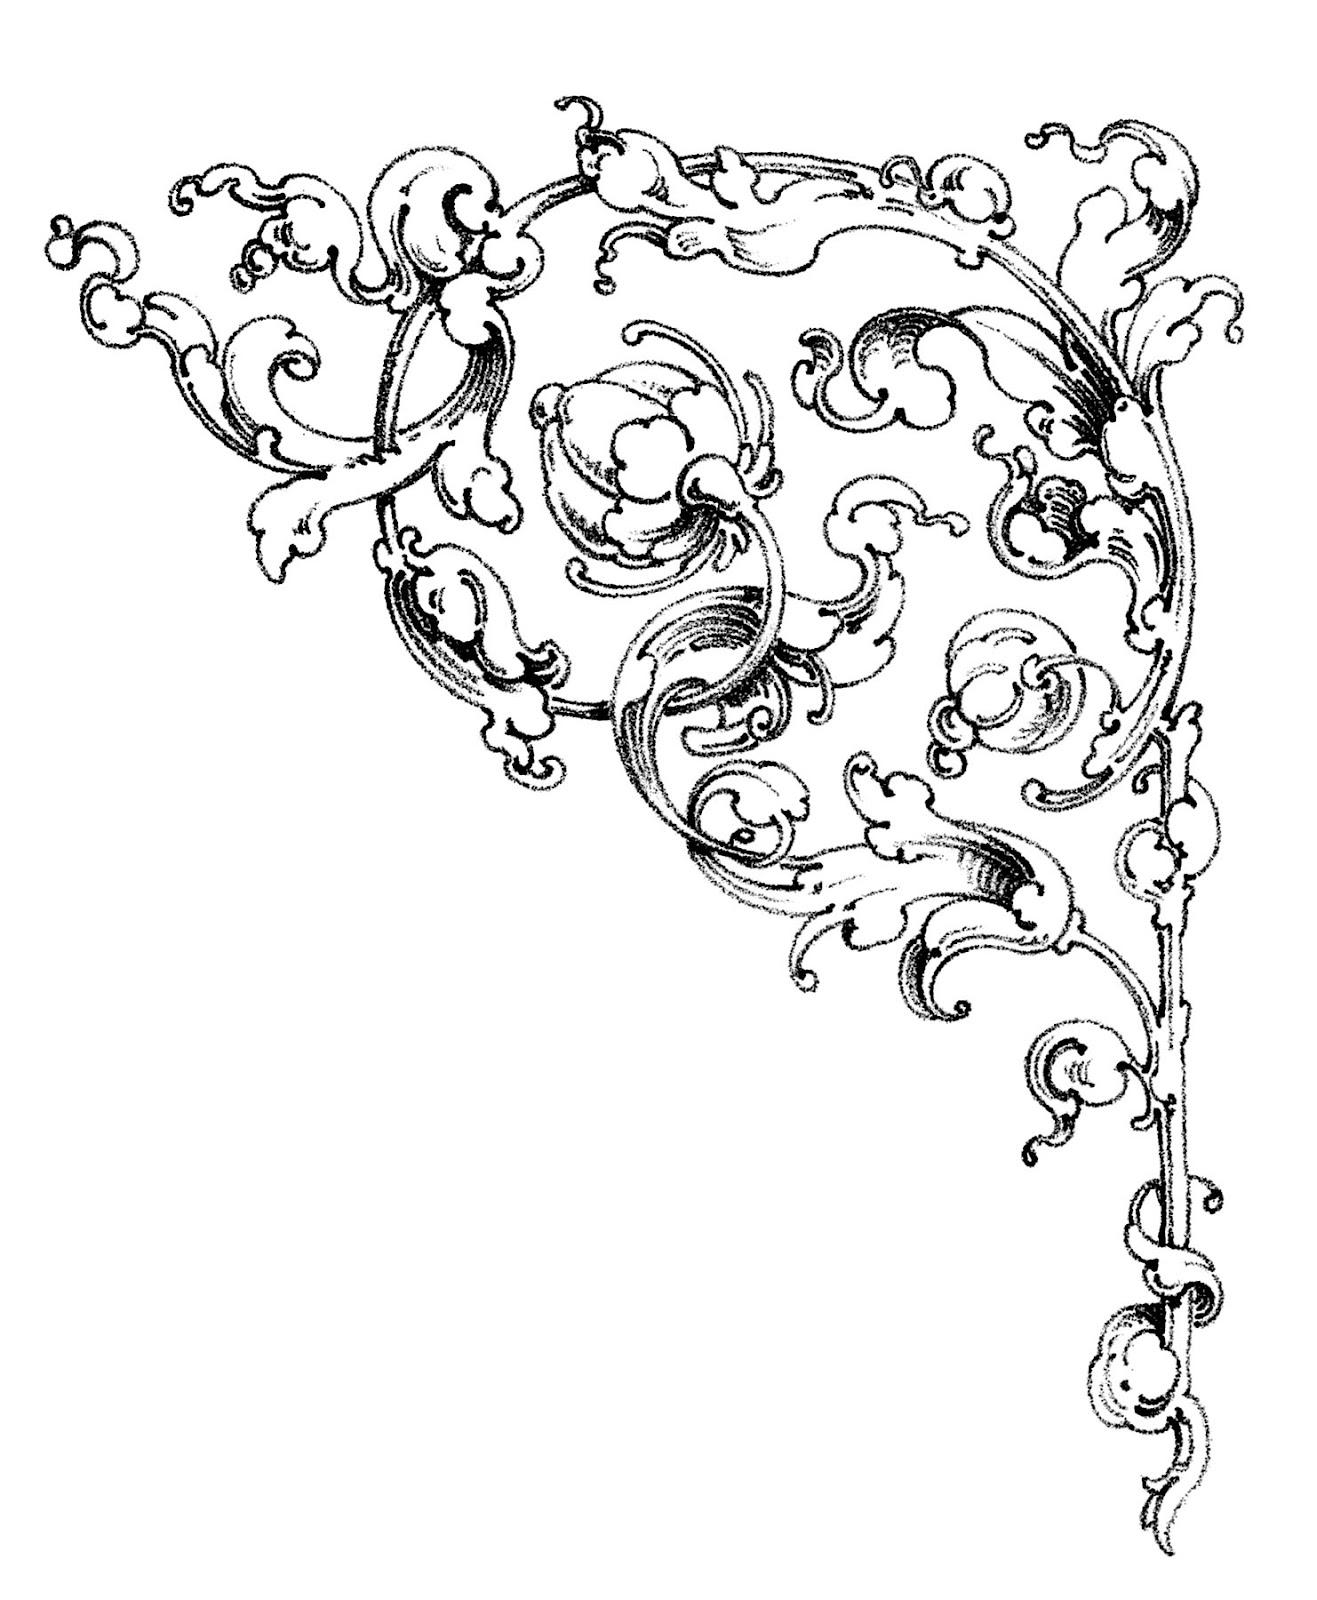 Scrolls - Wedding Clip Art ..-Scrolls - Wedding Clip Art ..-4